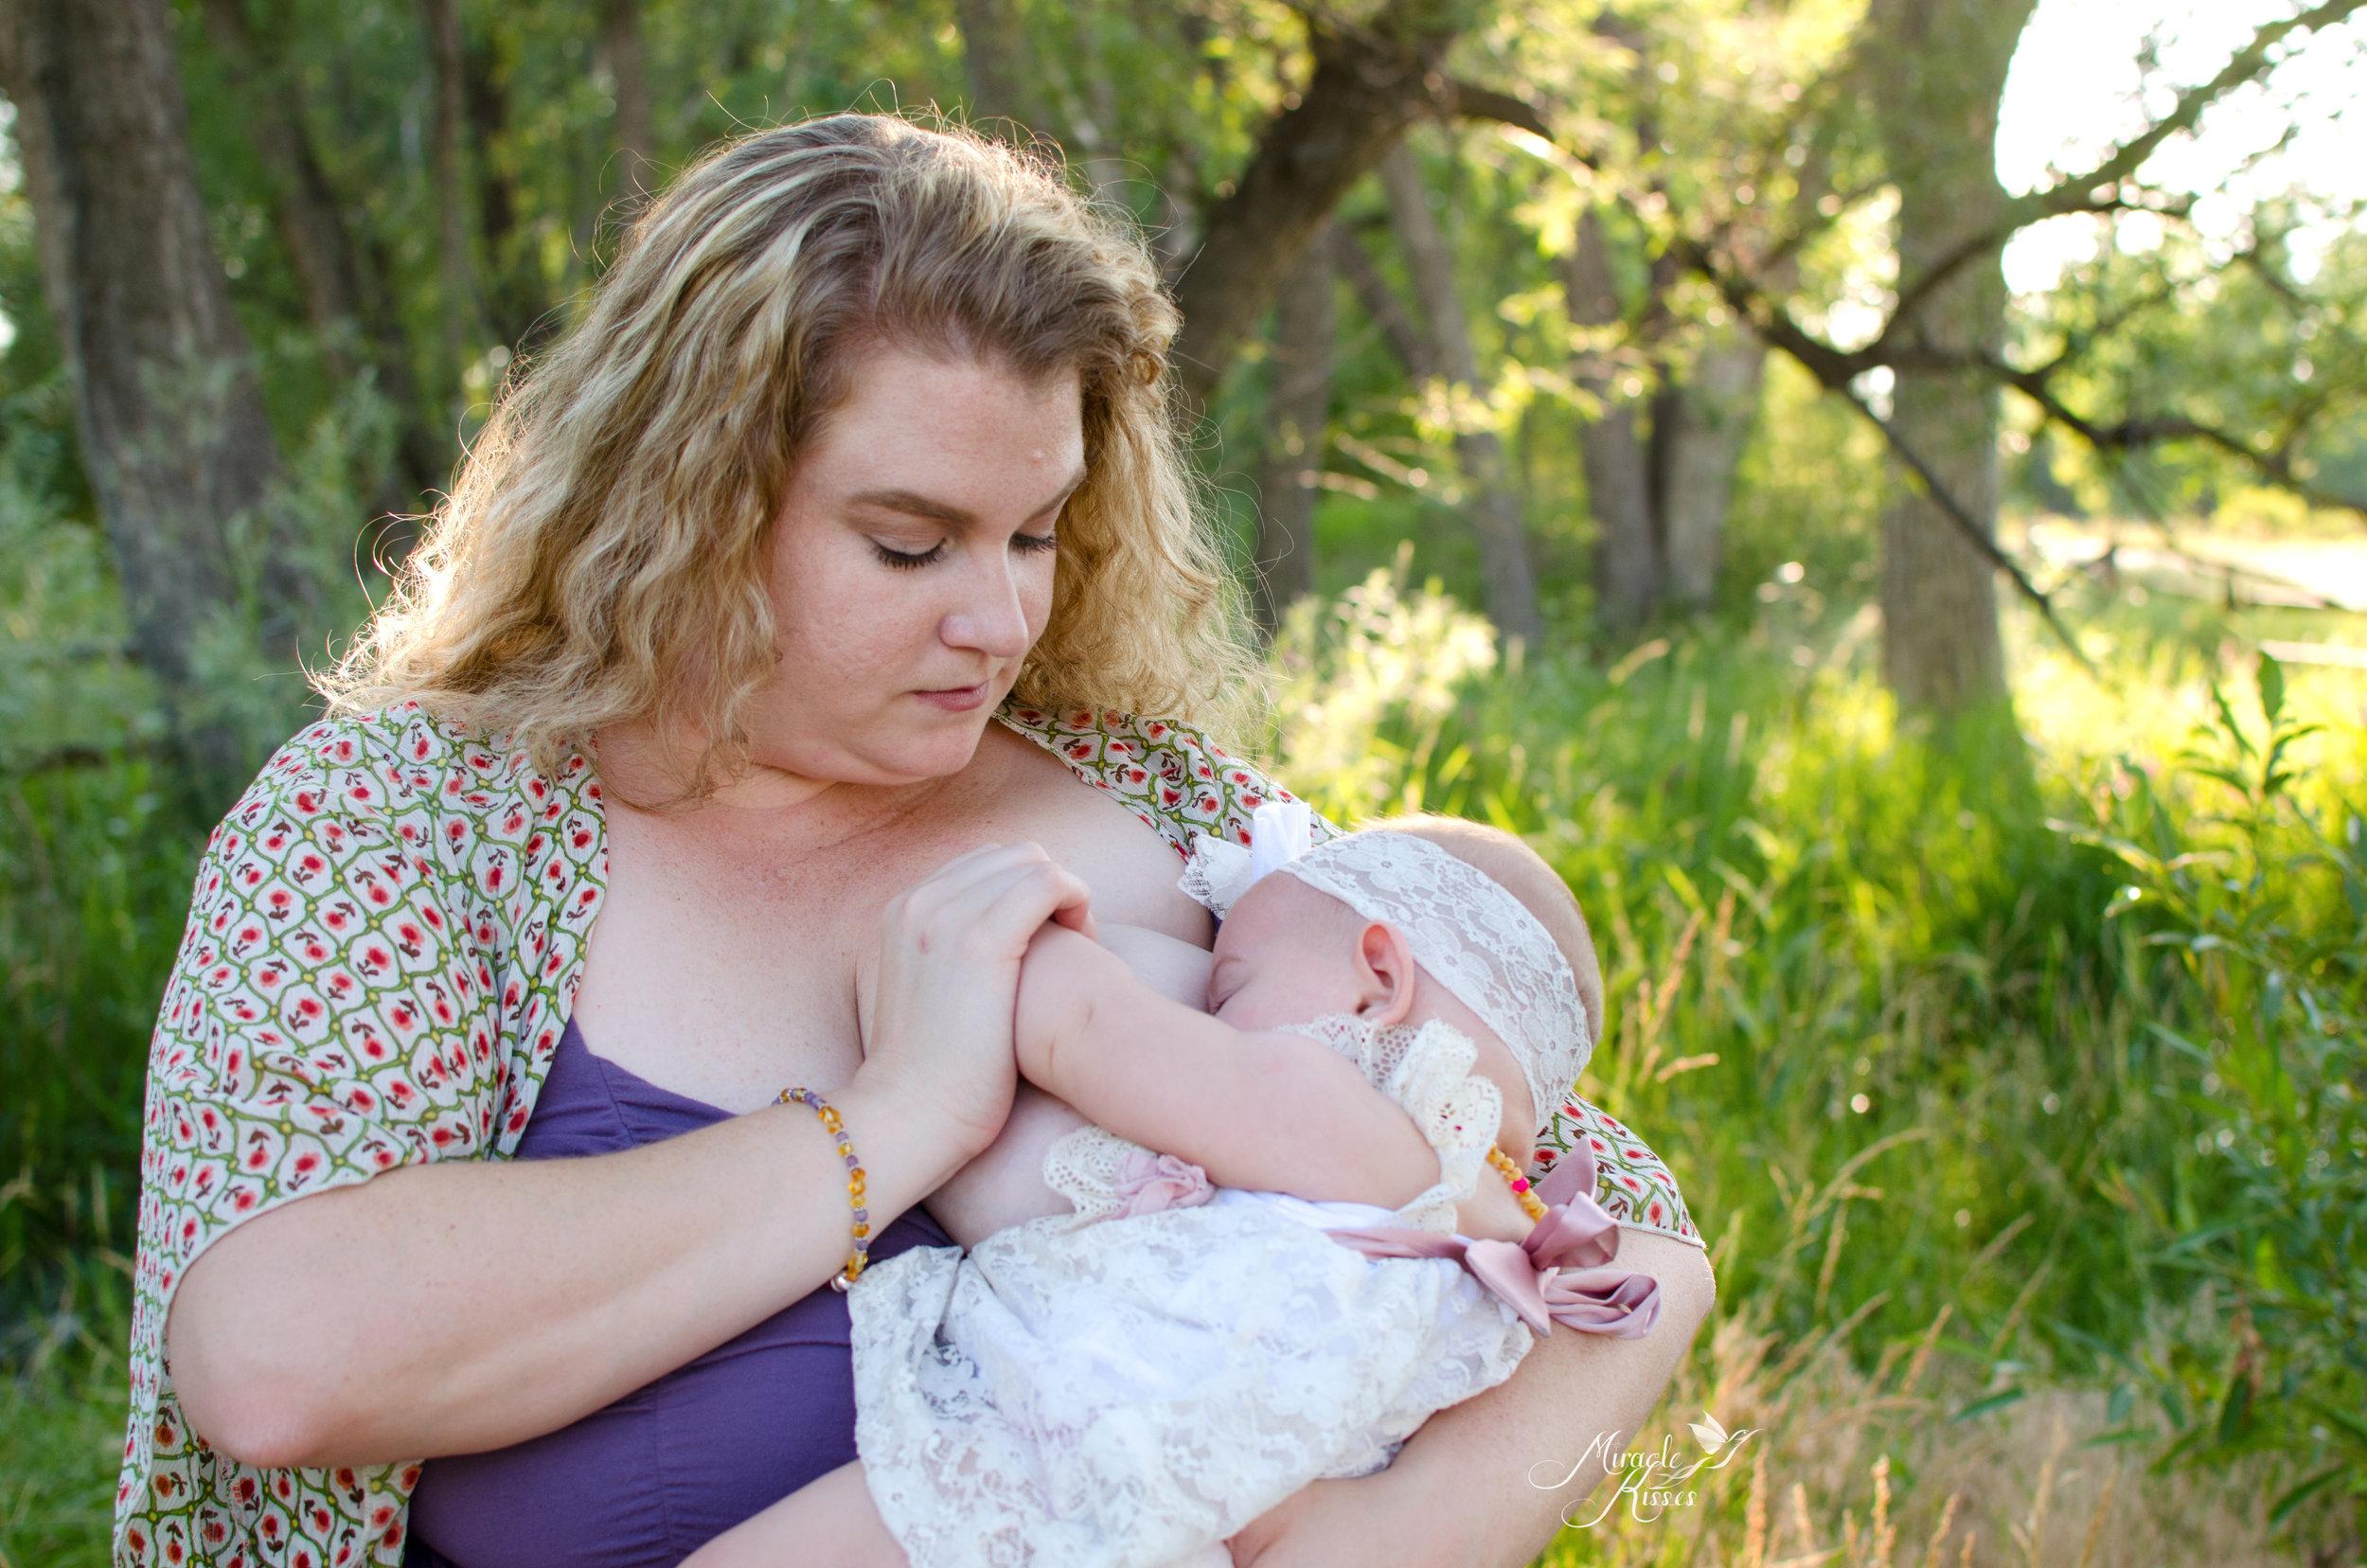 Outdoor breastfeeding in public, mothers love, nursing photography